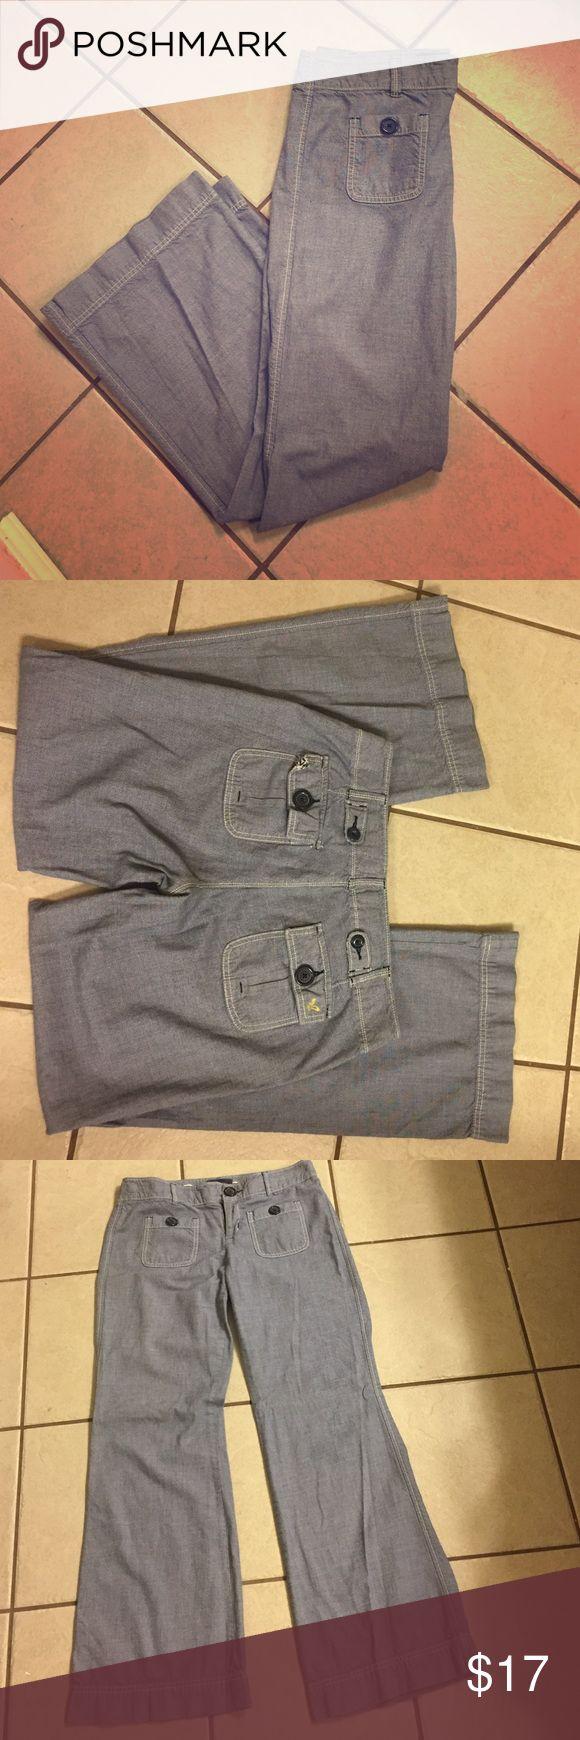 American Eagle Outfitters Pants Fabulous chambray fabric. American Eagle Outfitters size 6. Super cute. Wide leg. American Eagle Outfitters Pants Trousers